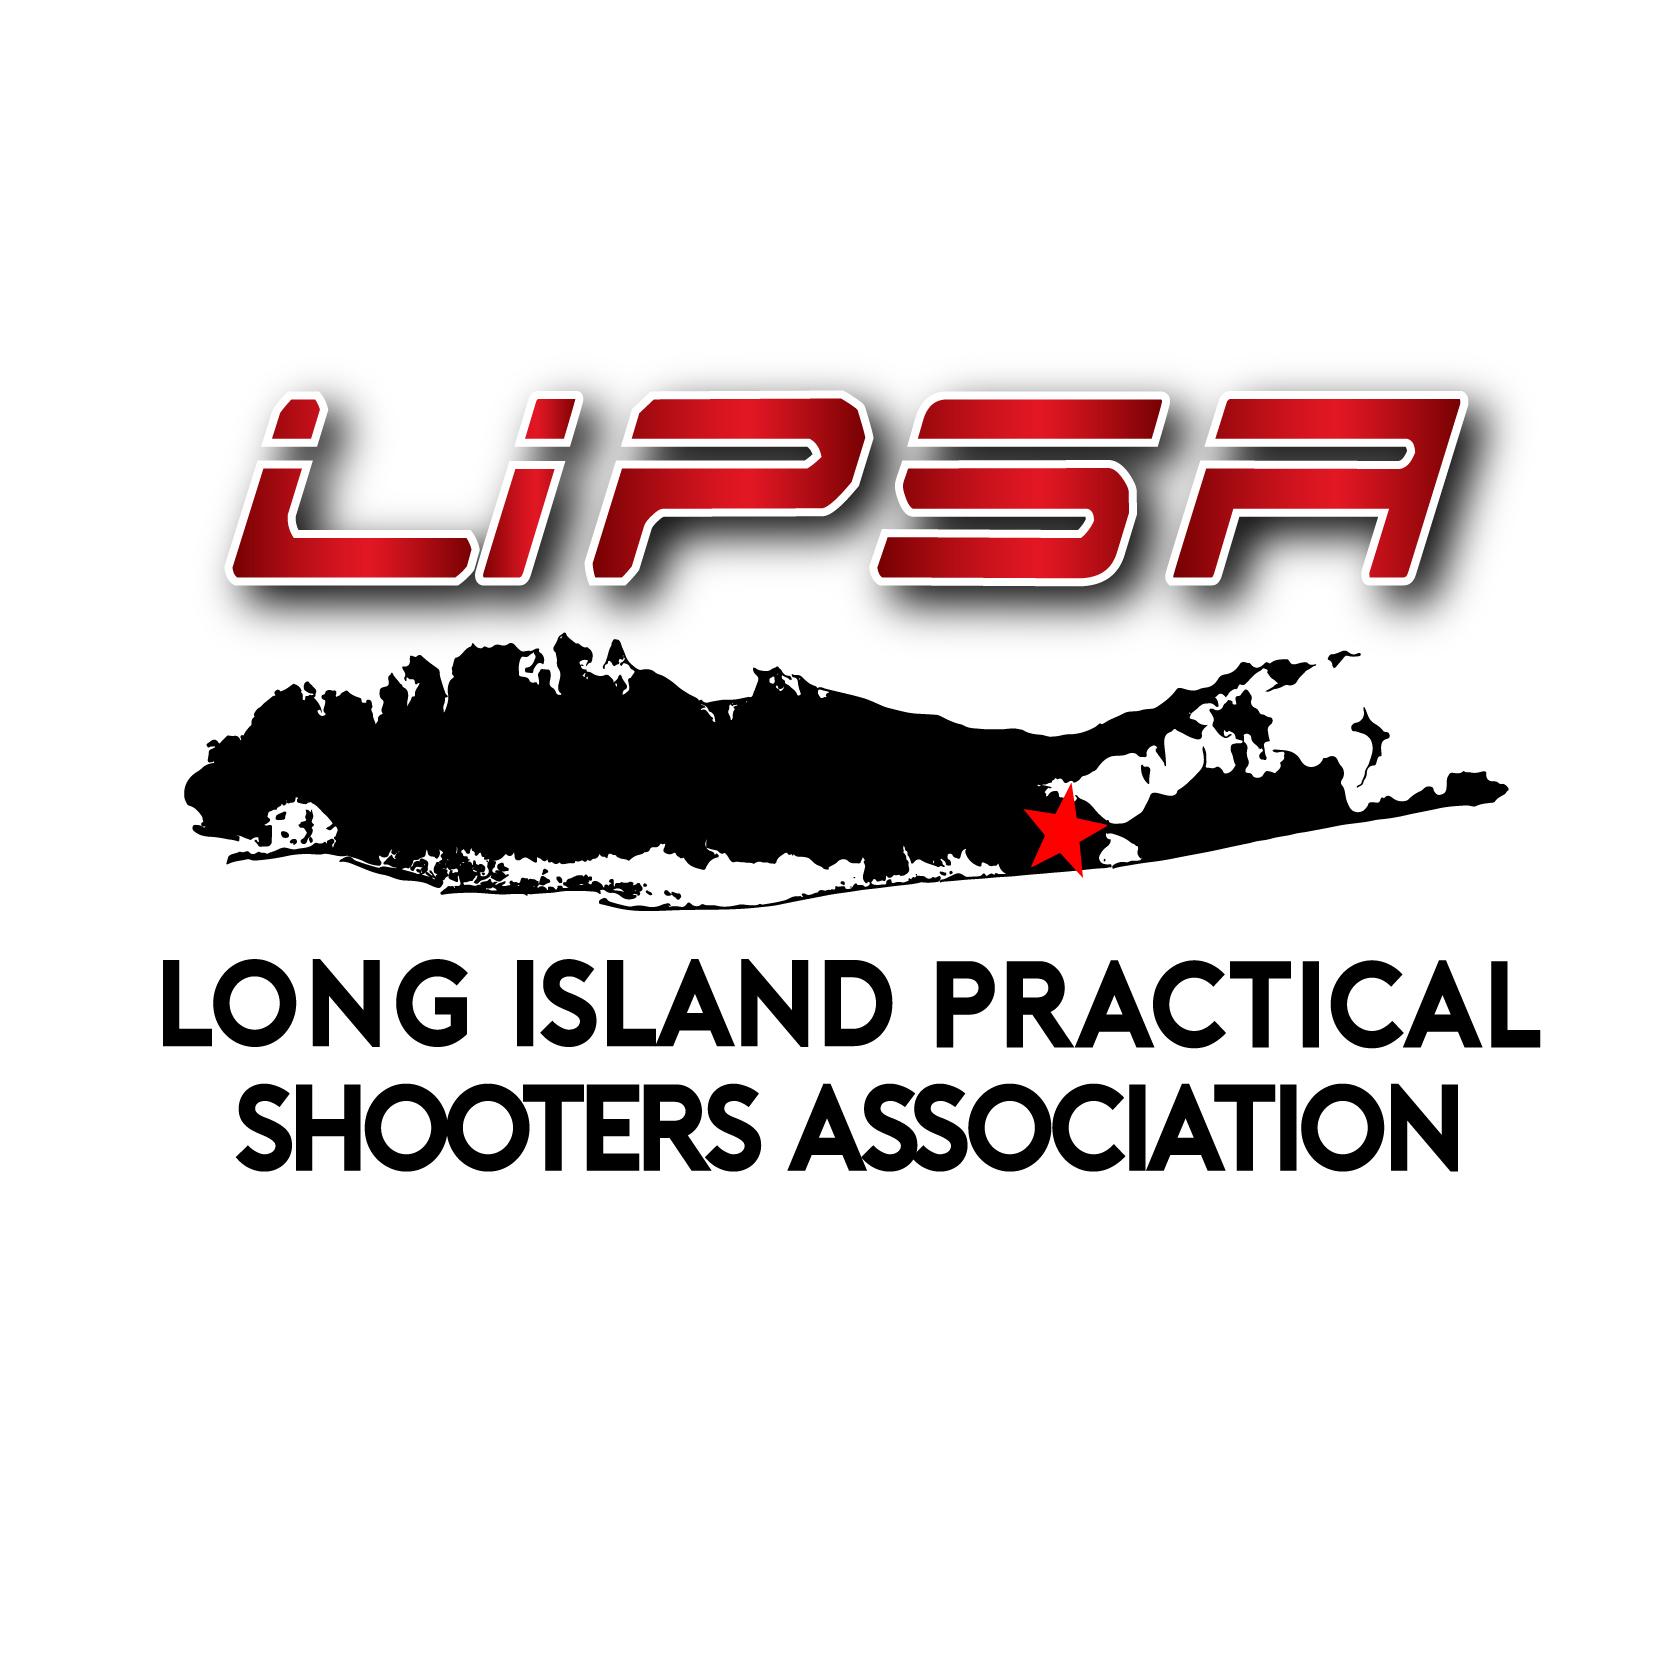 Long Island Practical Shooters Association LIPSA